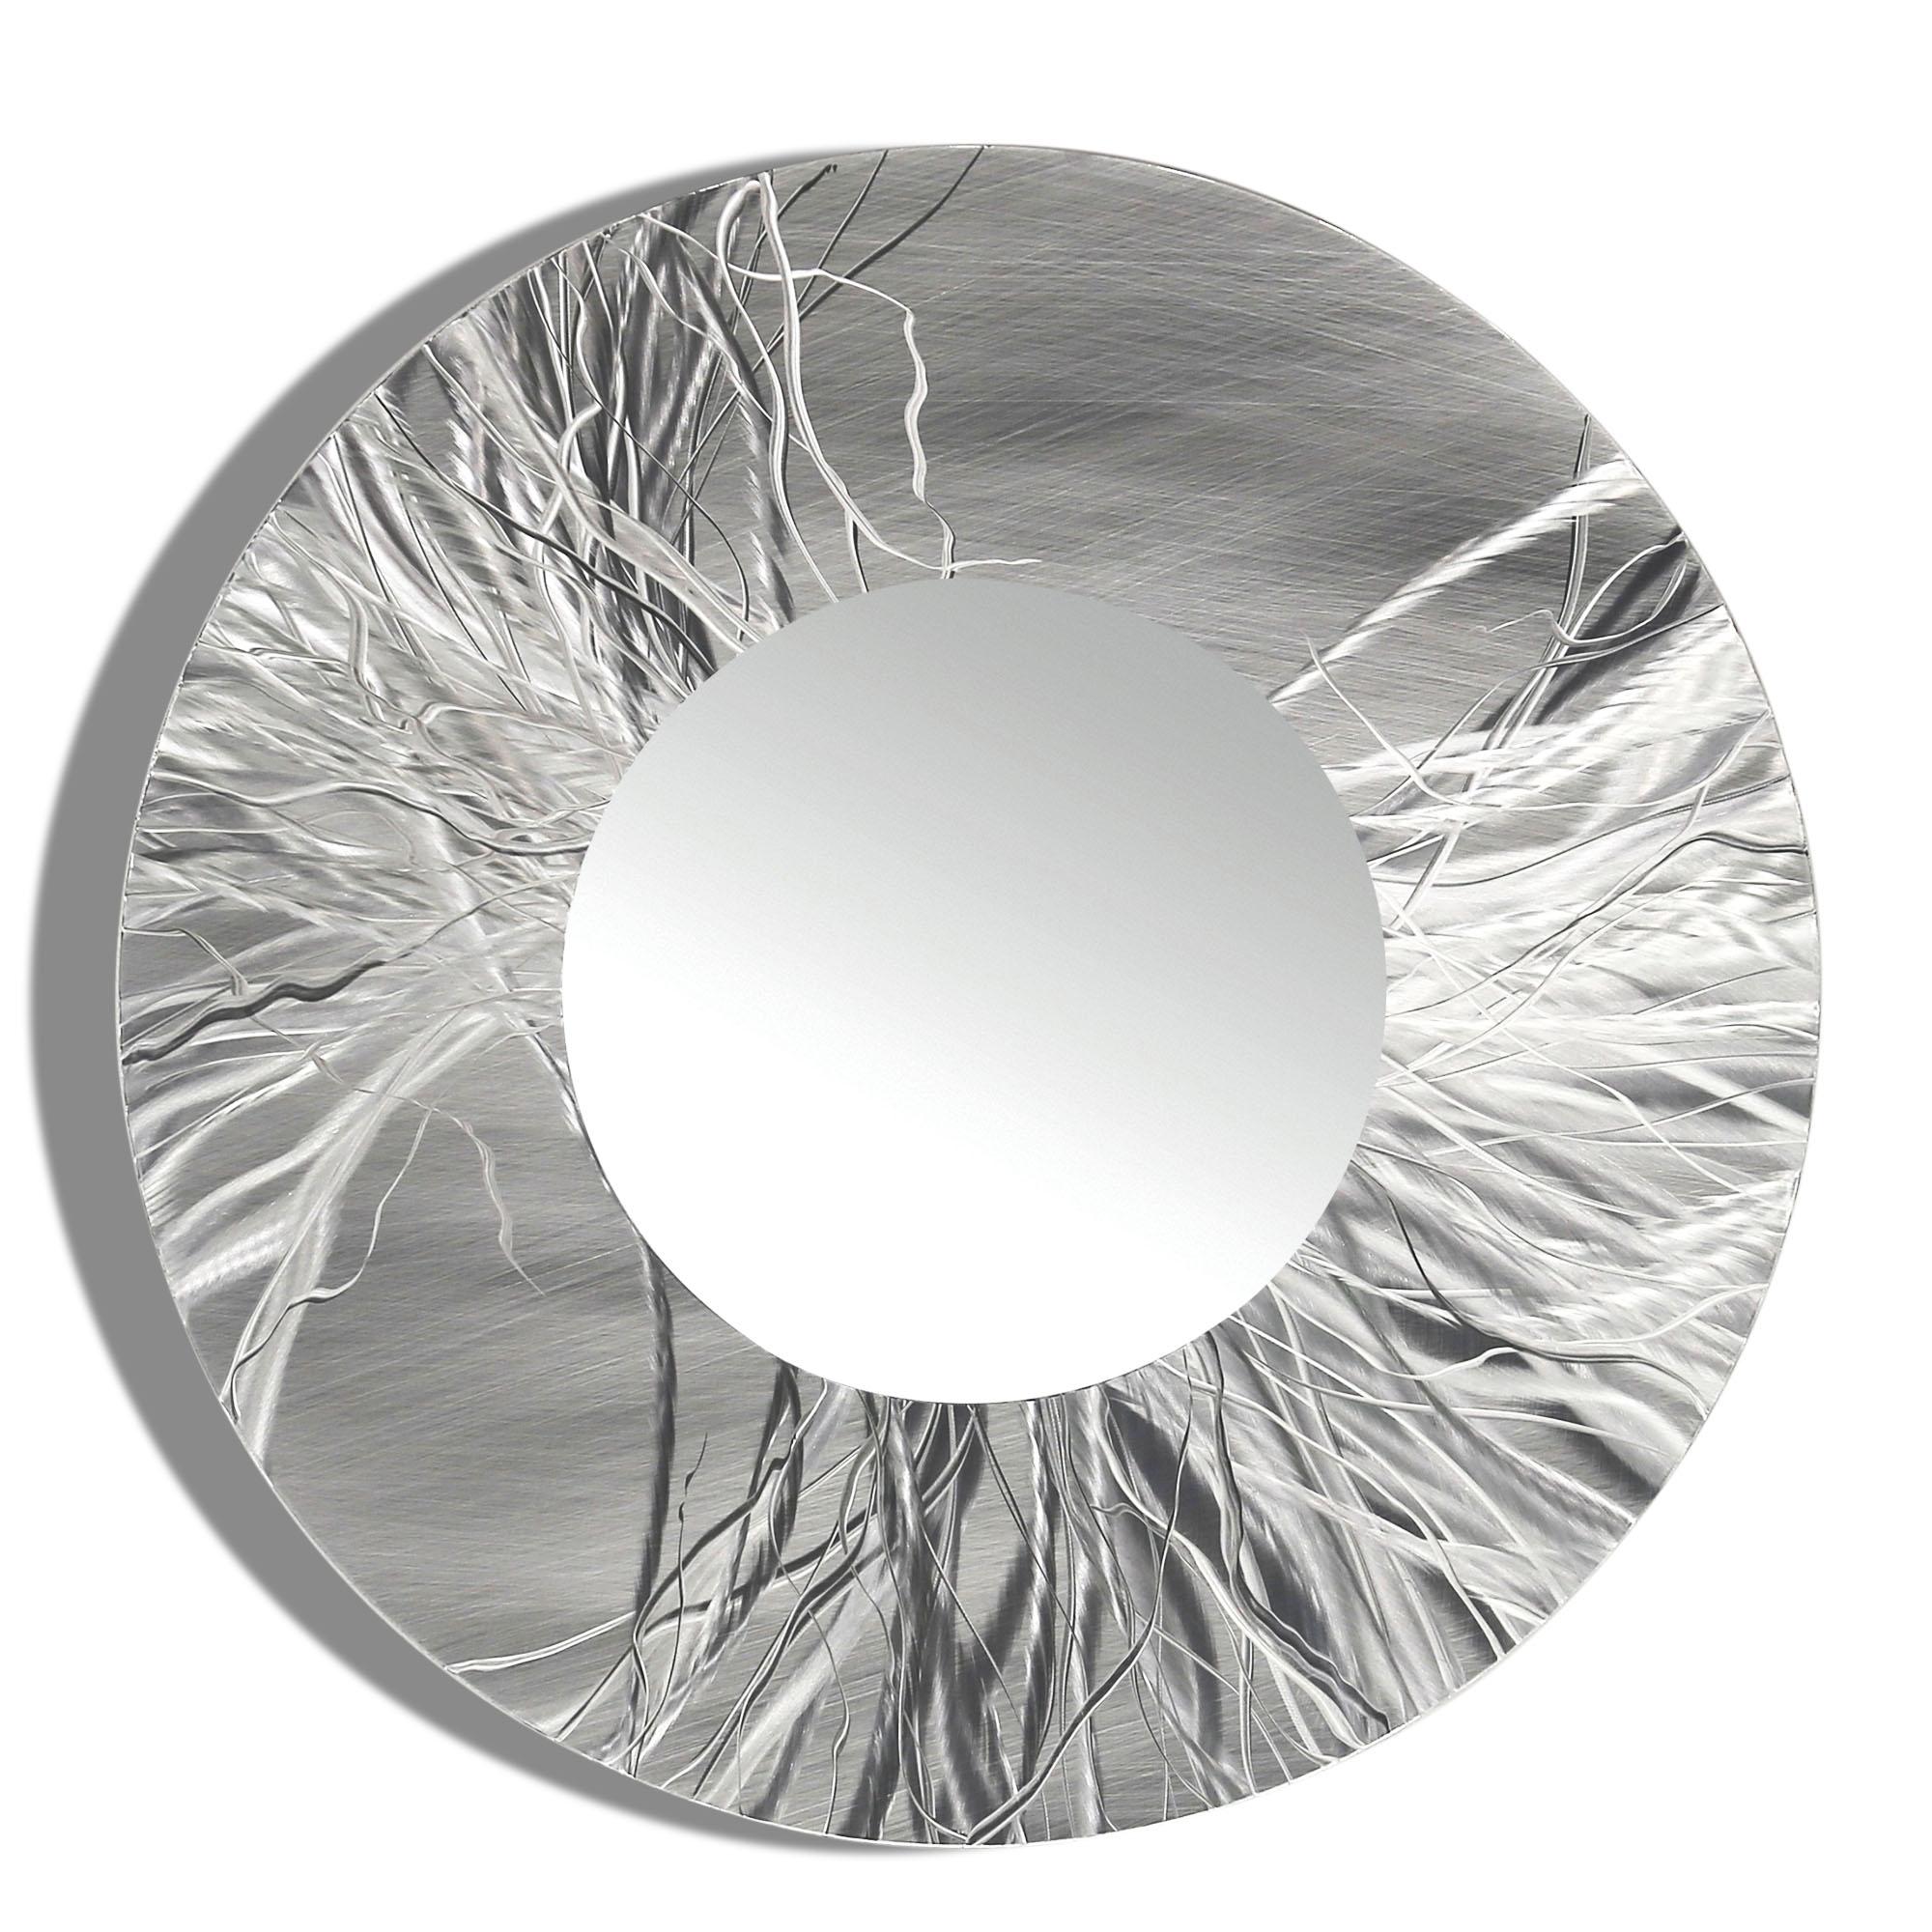 Mirror 104 Round Silver Contemporary Metal Wall Art Round Mirror Inside Round Silver Mirror (Image 7 of 15)